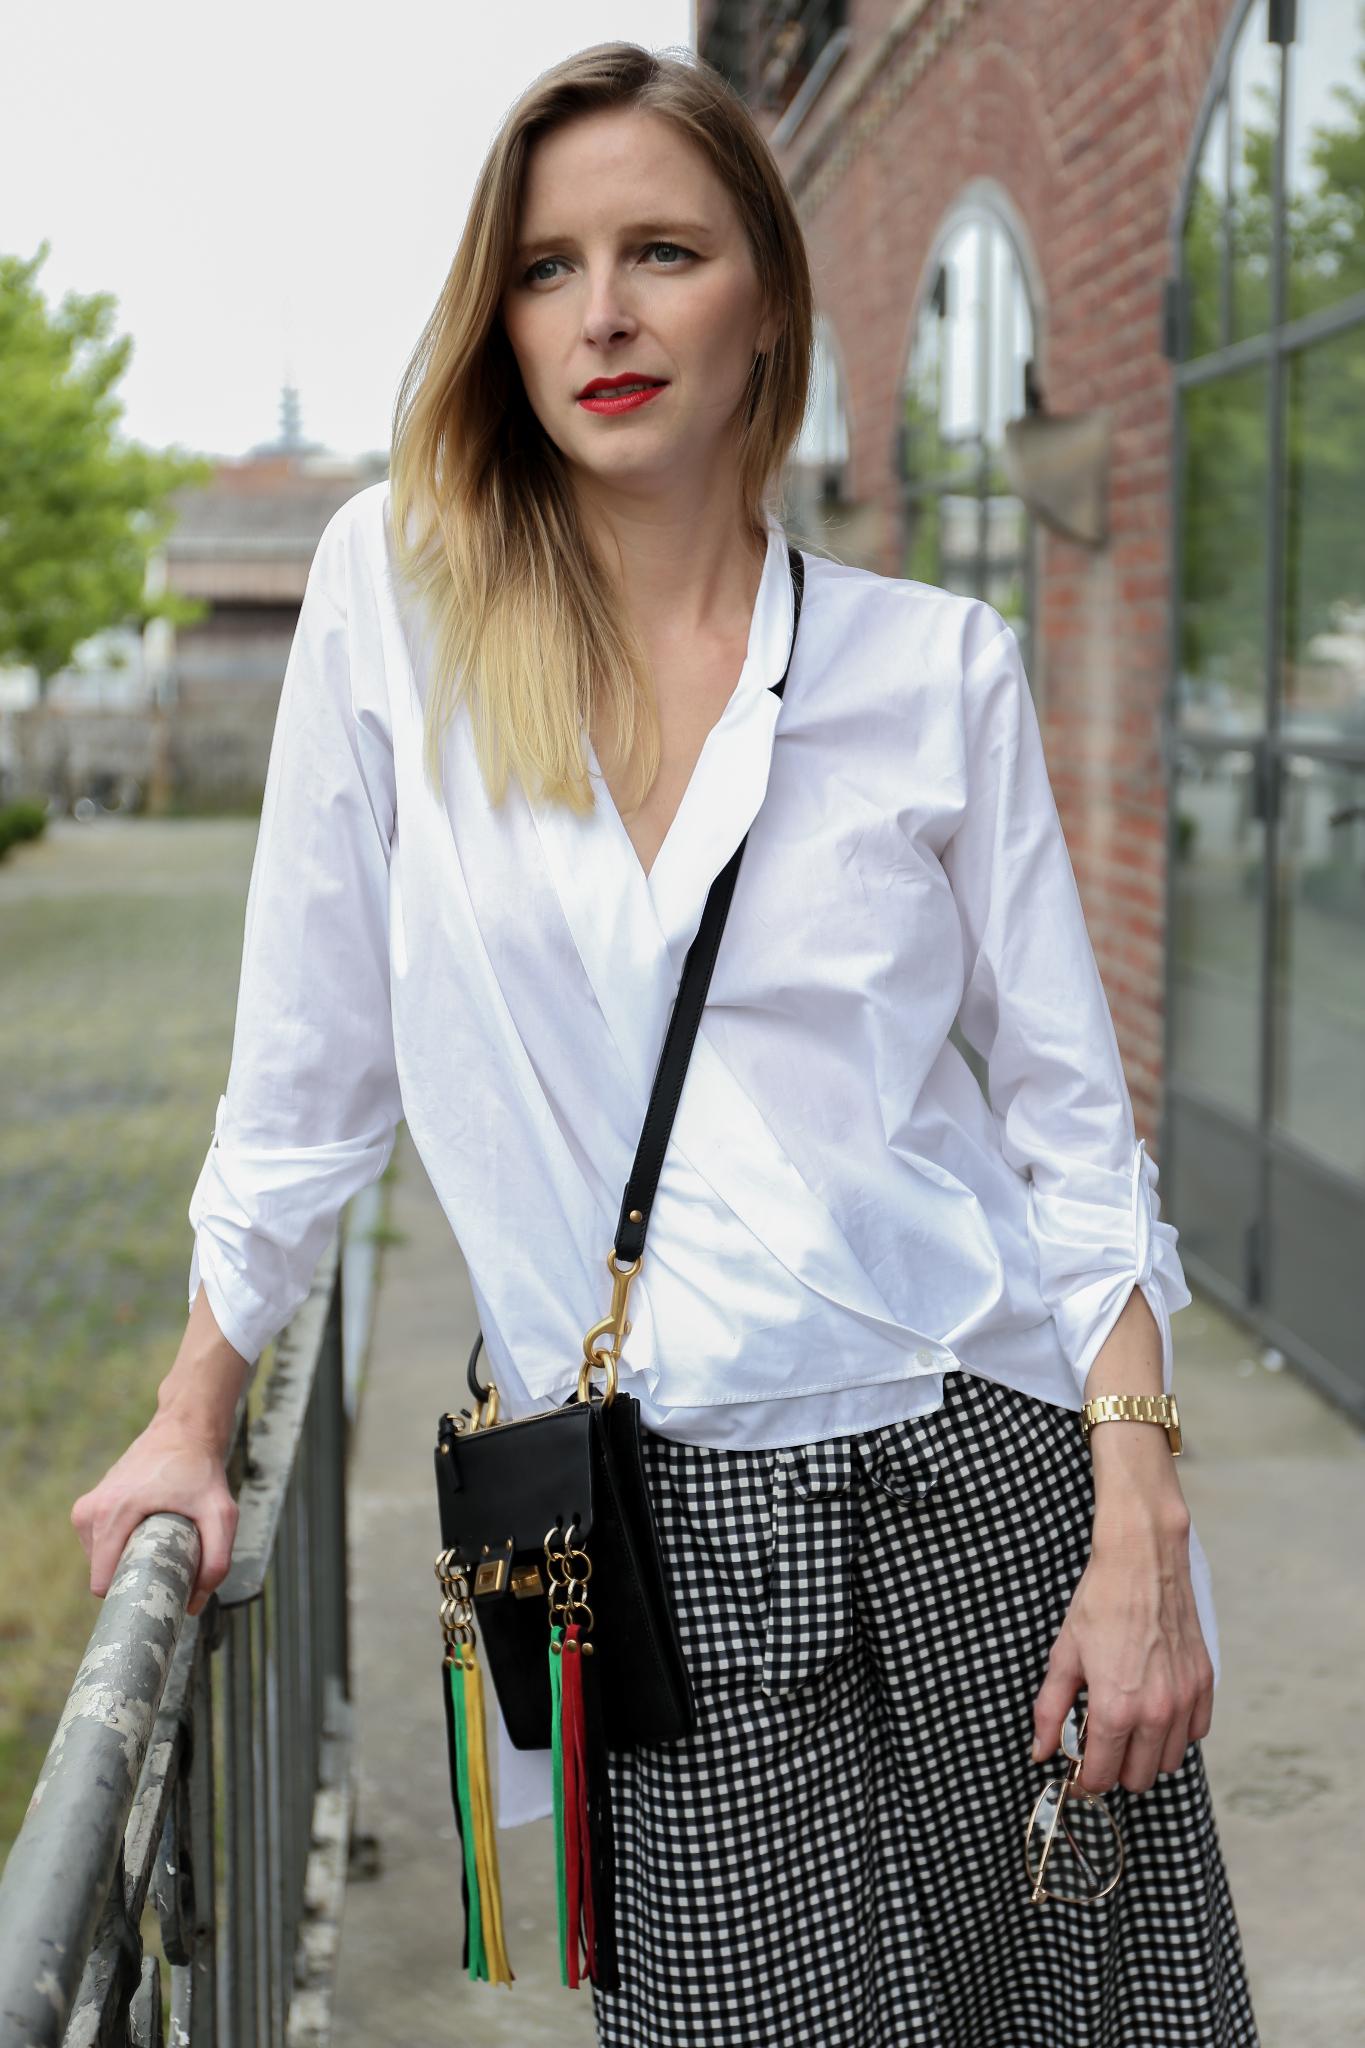 Fashion_Outfit_Chloé_Jane_Vichy_Print_MOD - by Monique-13